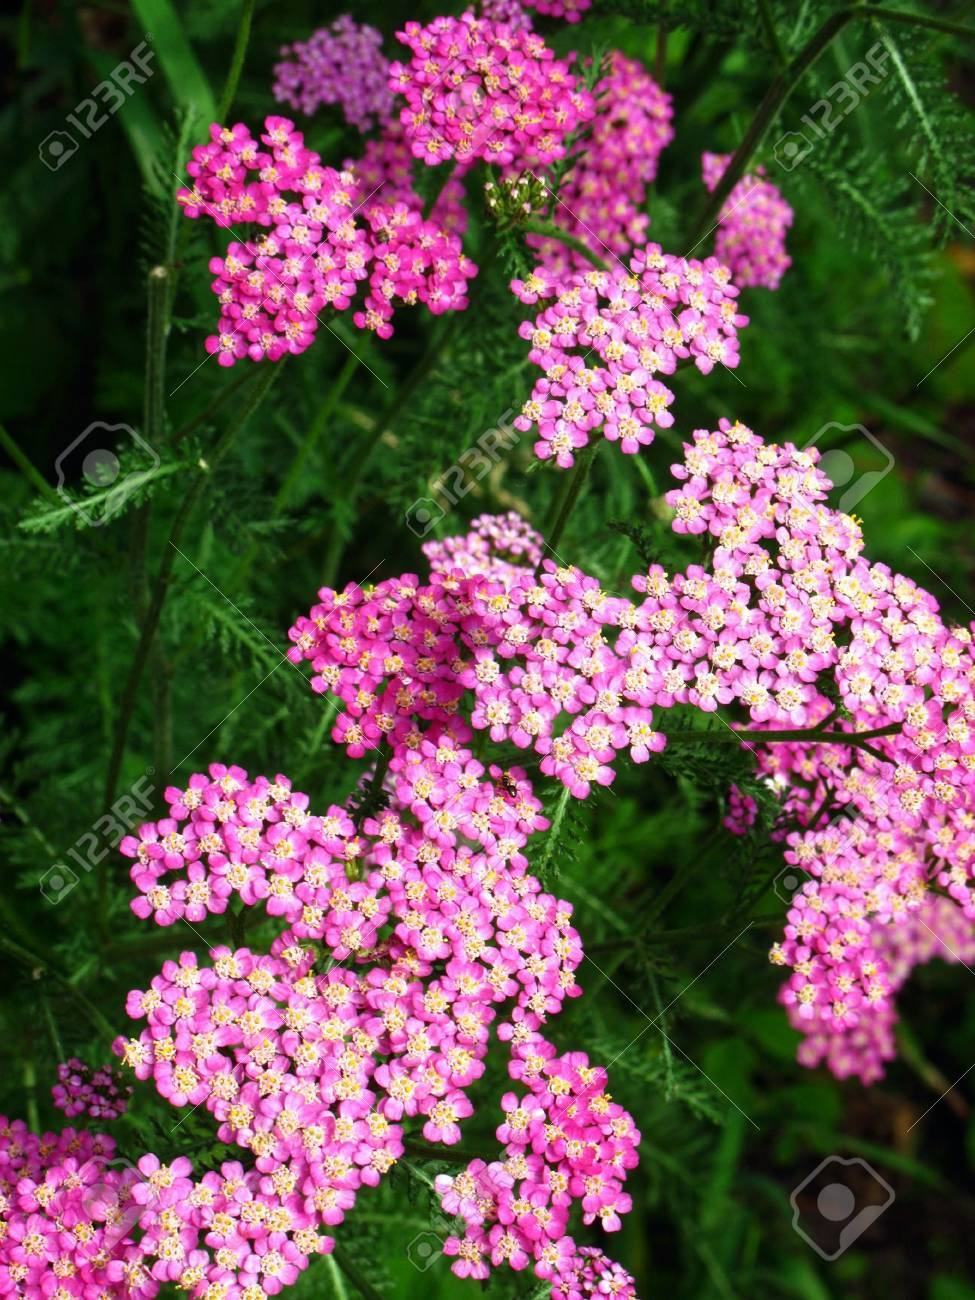 Milfoil flowers closeup in the summer garden Stock Photo - 5091202